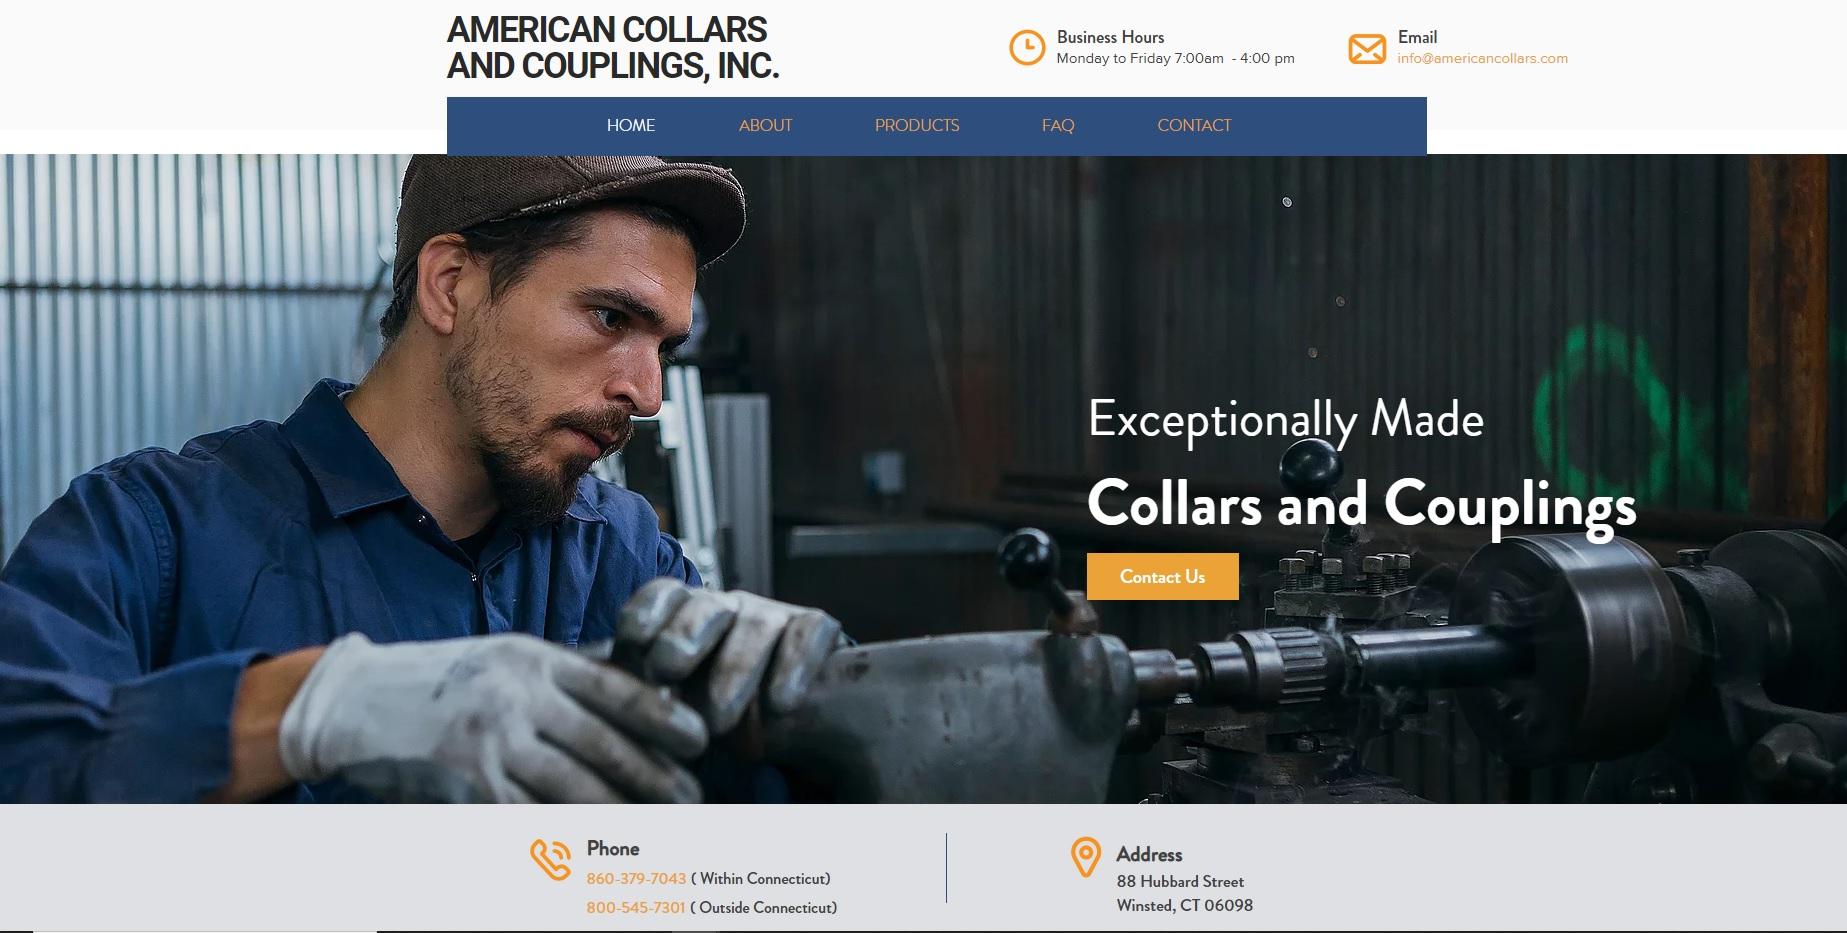 American Collars and Couplings, Inc.